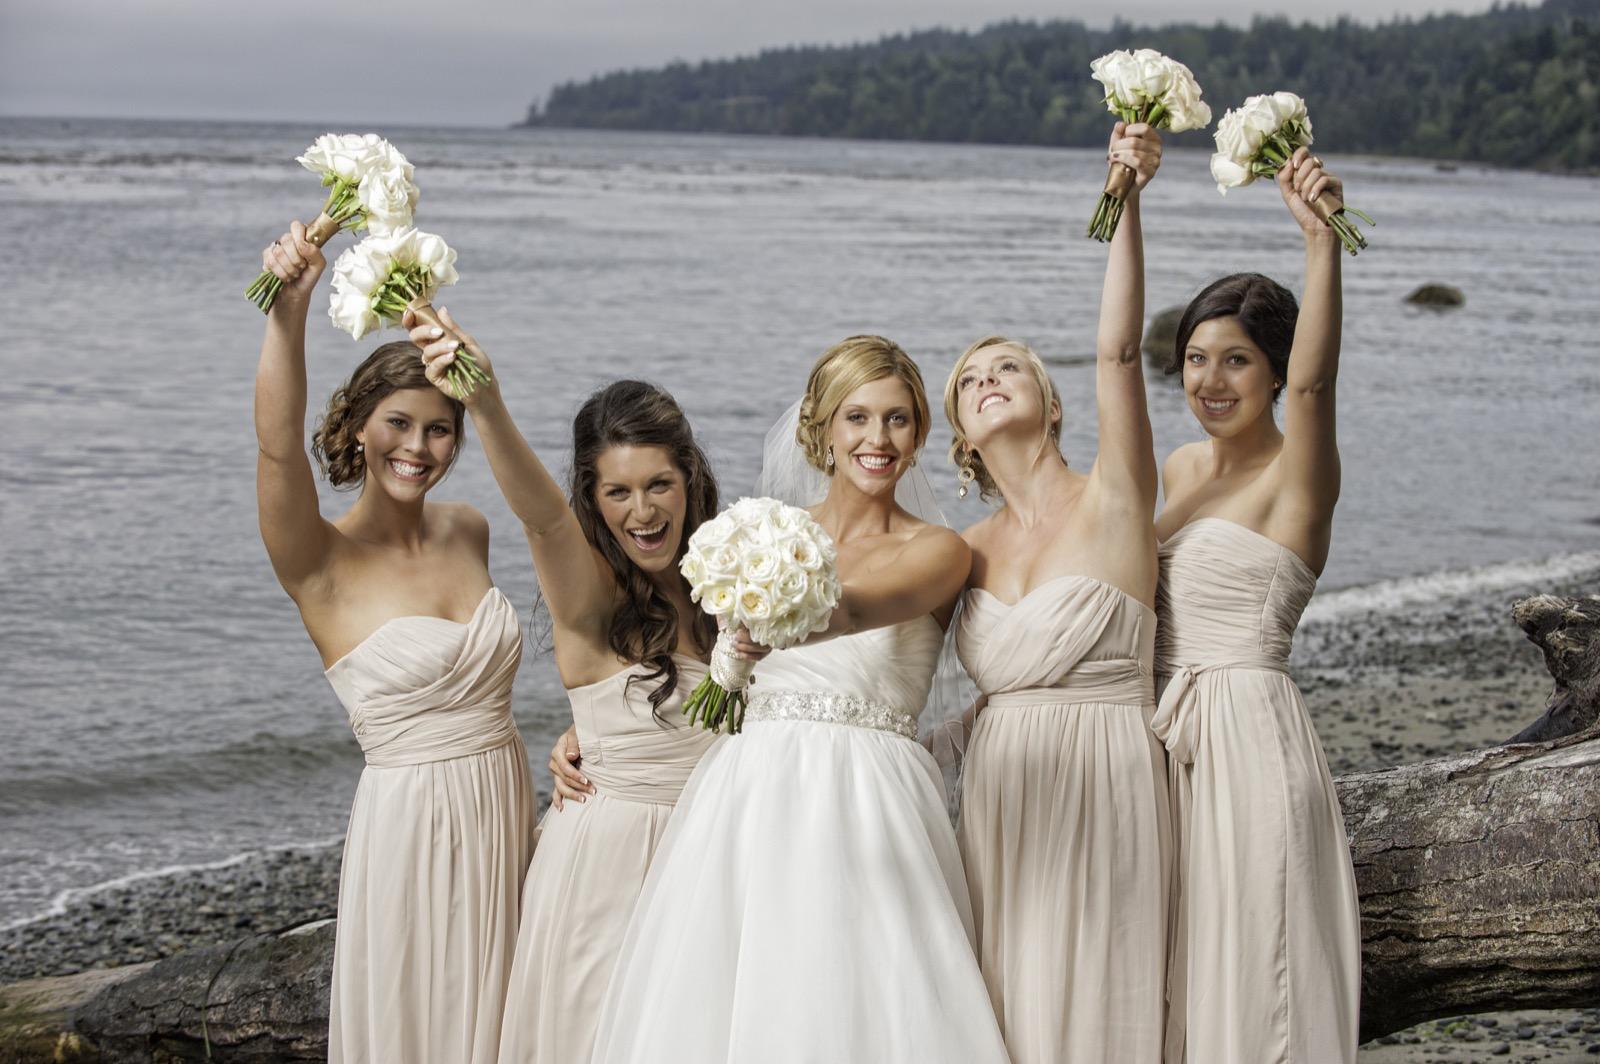 sooke-wedding-photographers-craidelonna-oceanedge-lodge-wedding-68.jpg